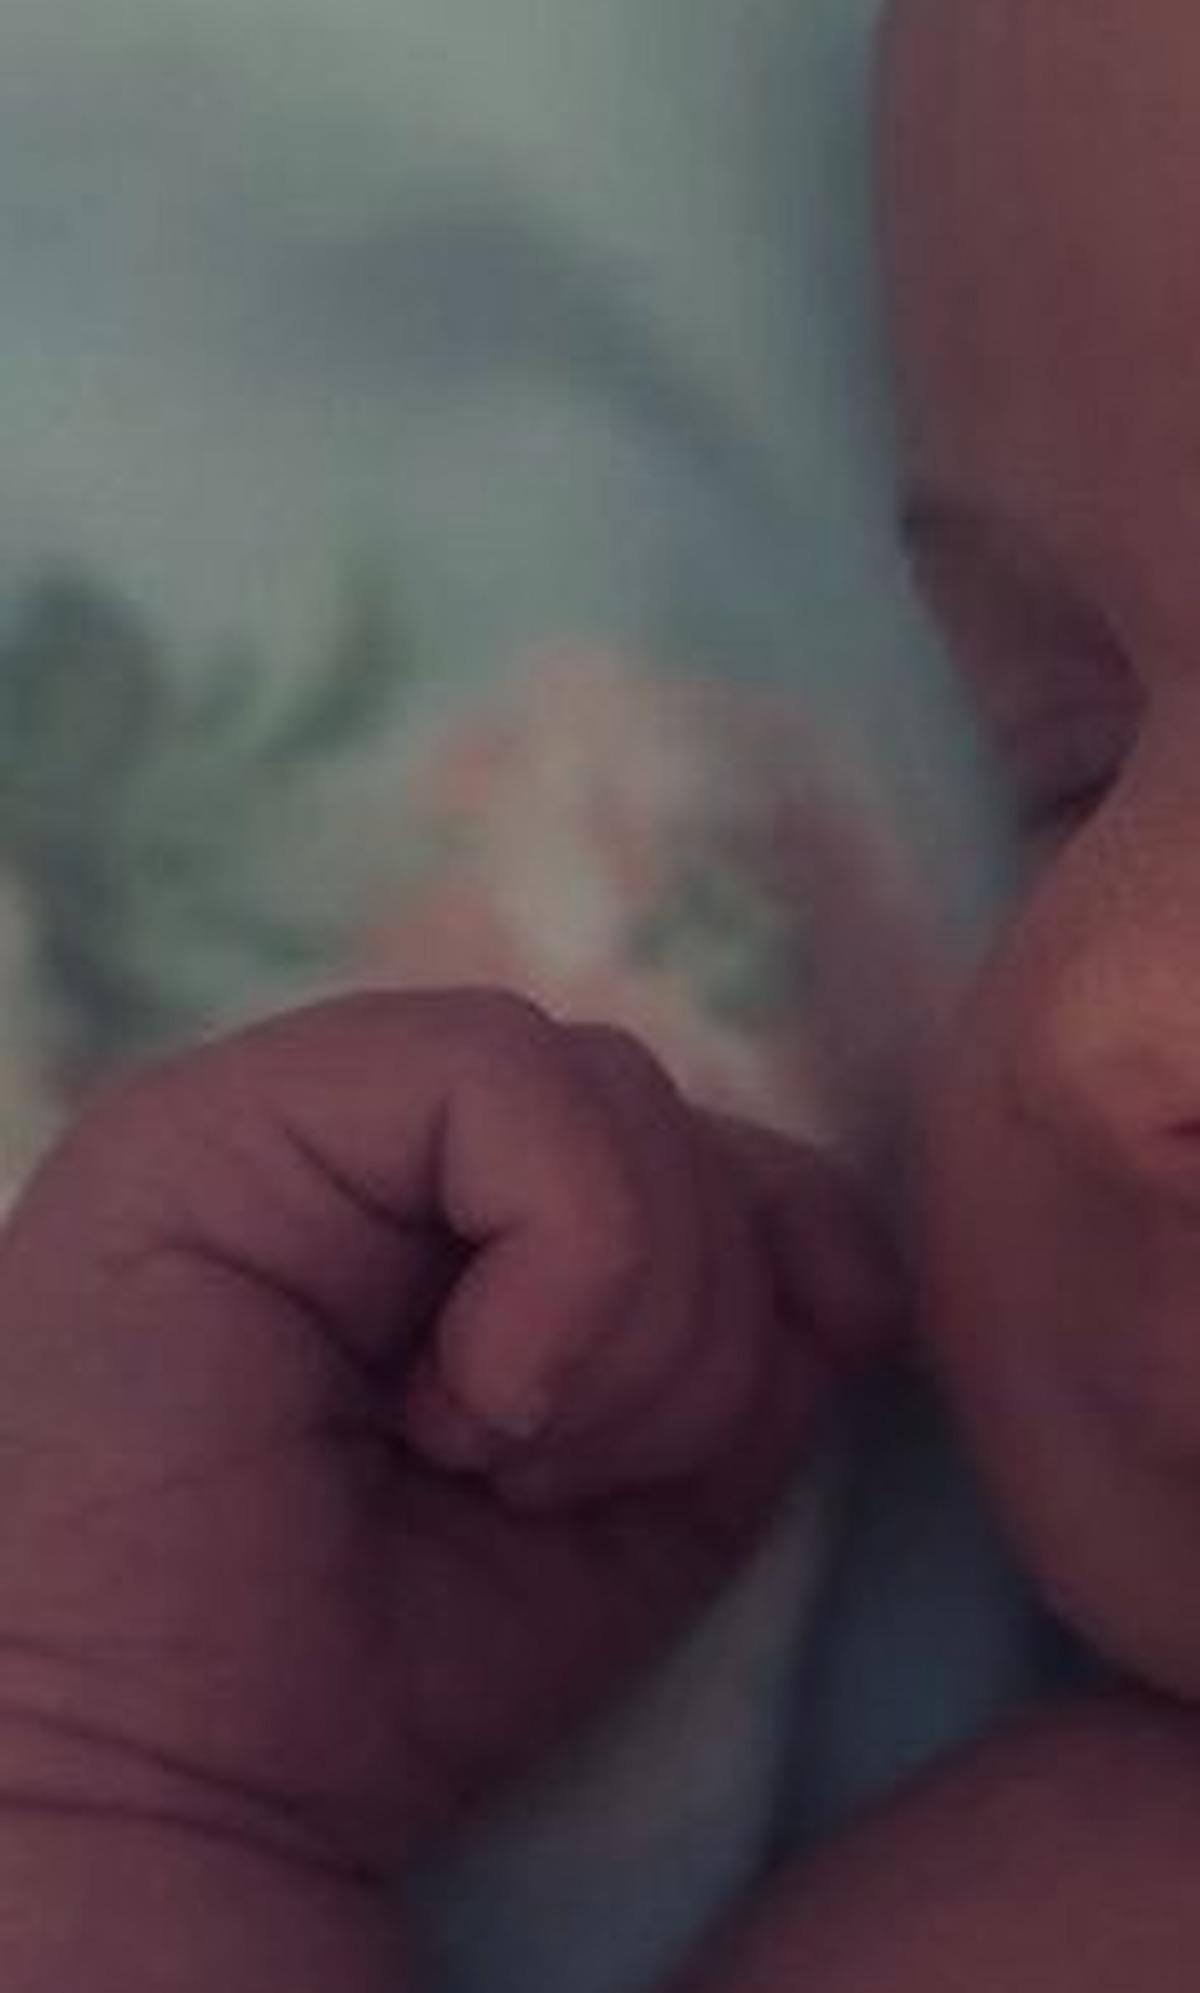 Eve Myles attrice Toorchwood nata figlia